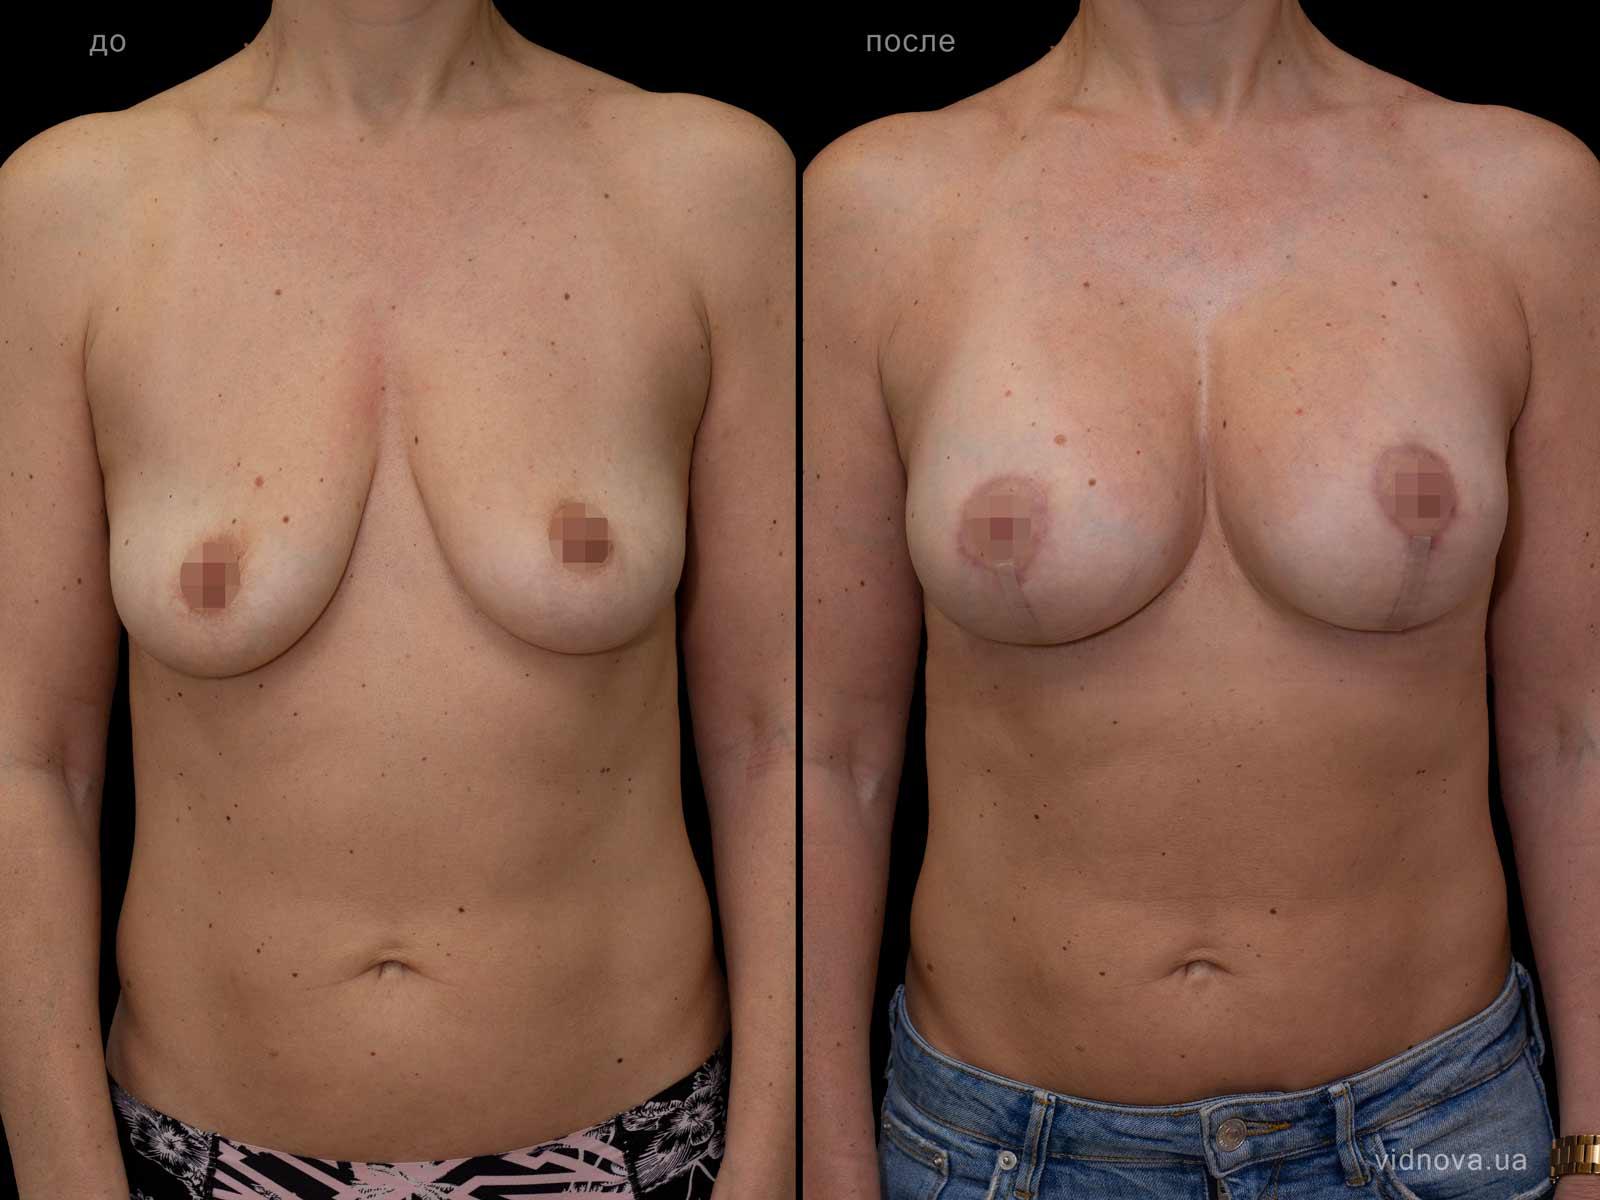 Подтяжка груди 1 8